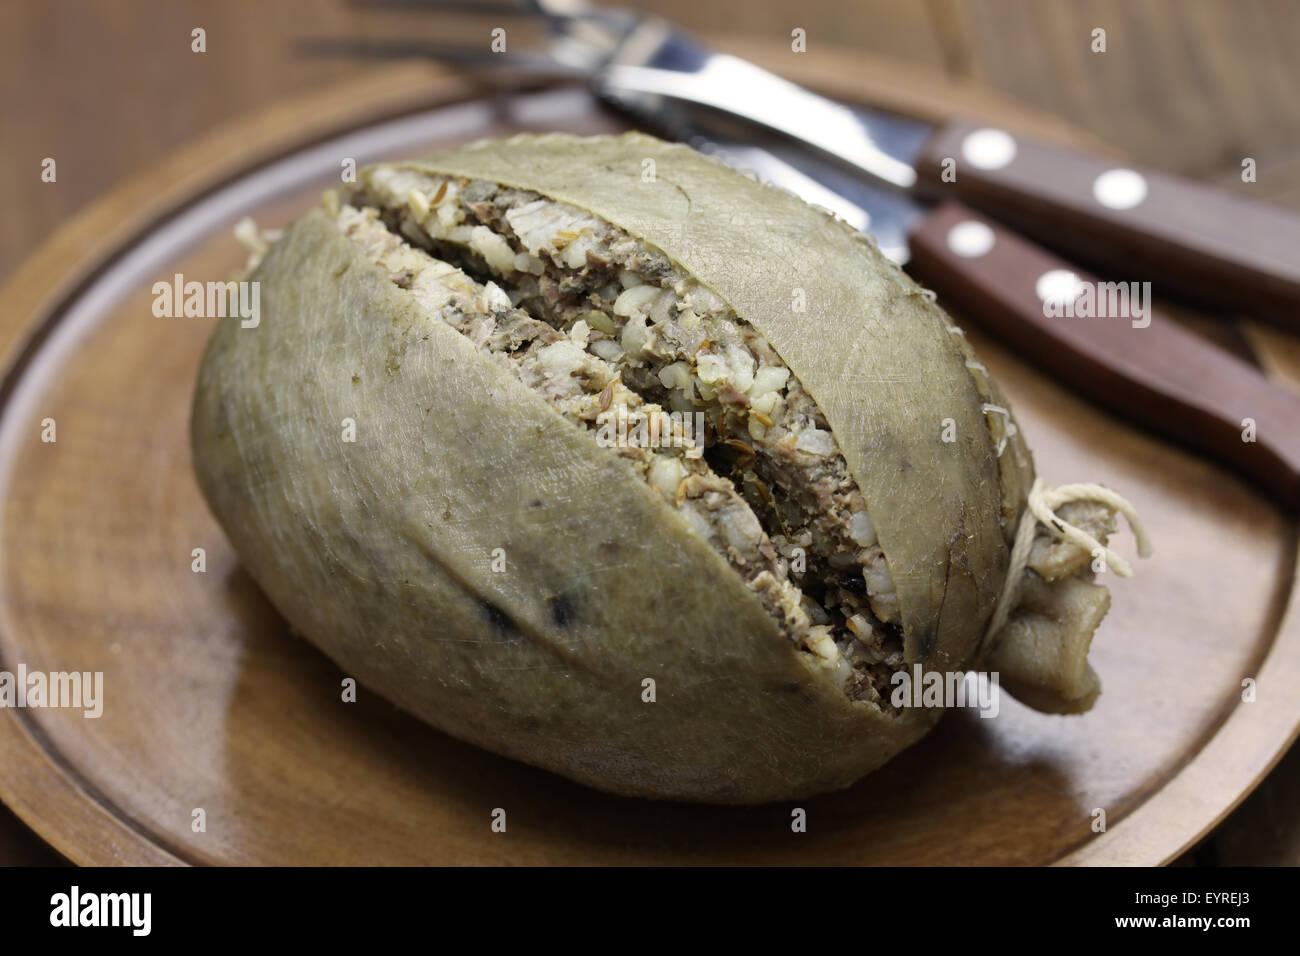 Escocia haggis, comida casera aislado sobre fondo de madera Imagen De Stock